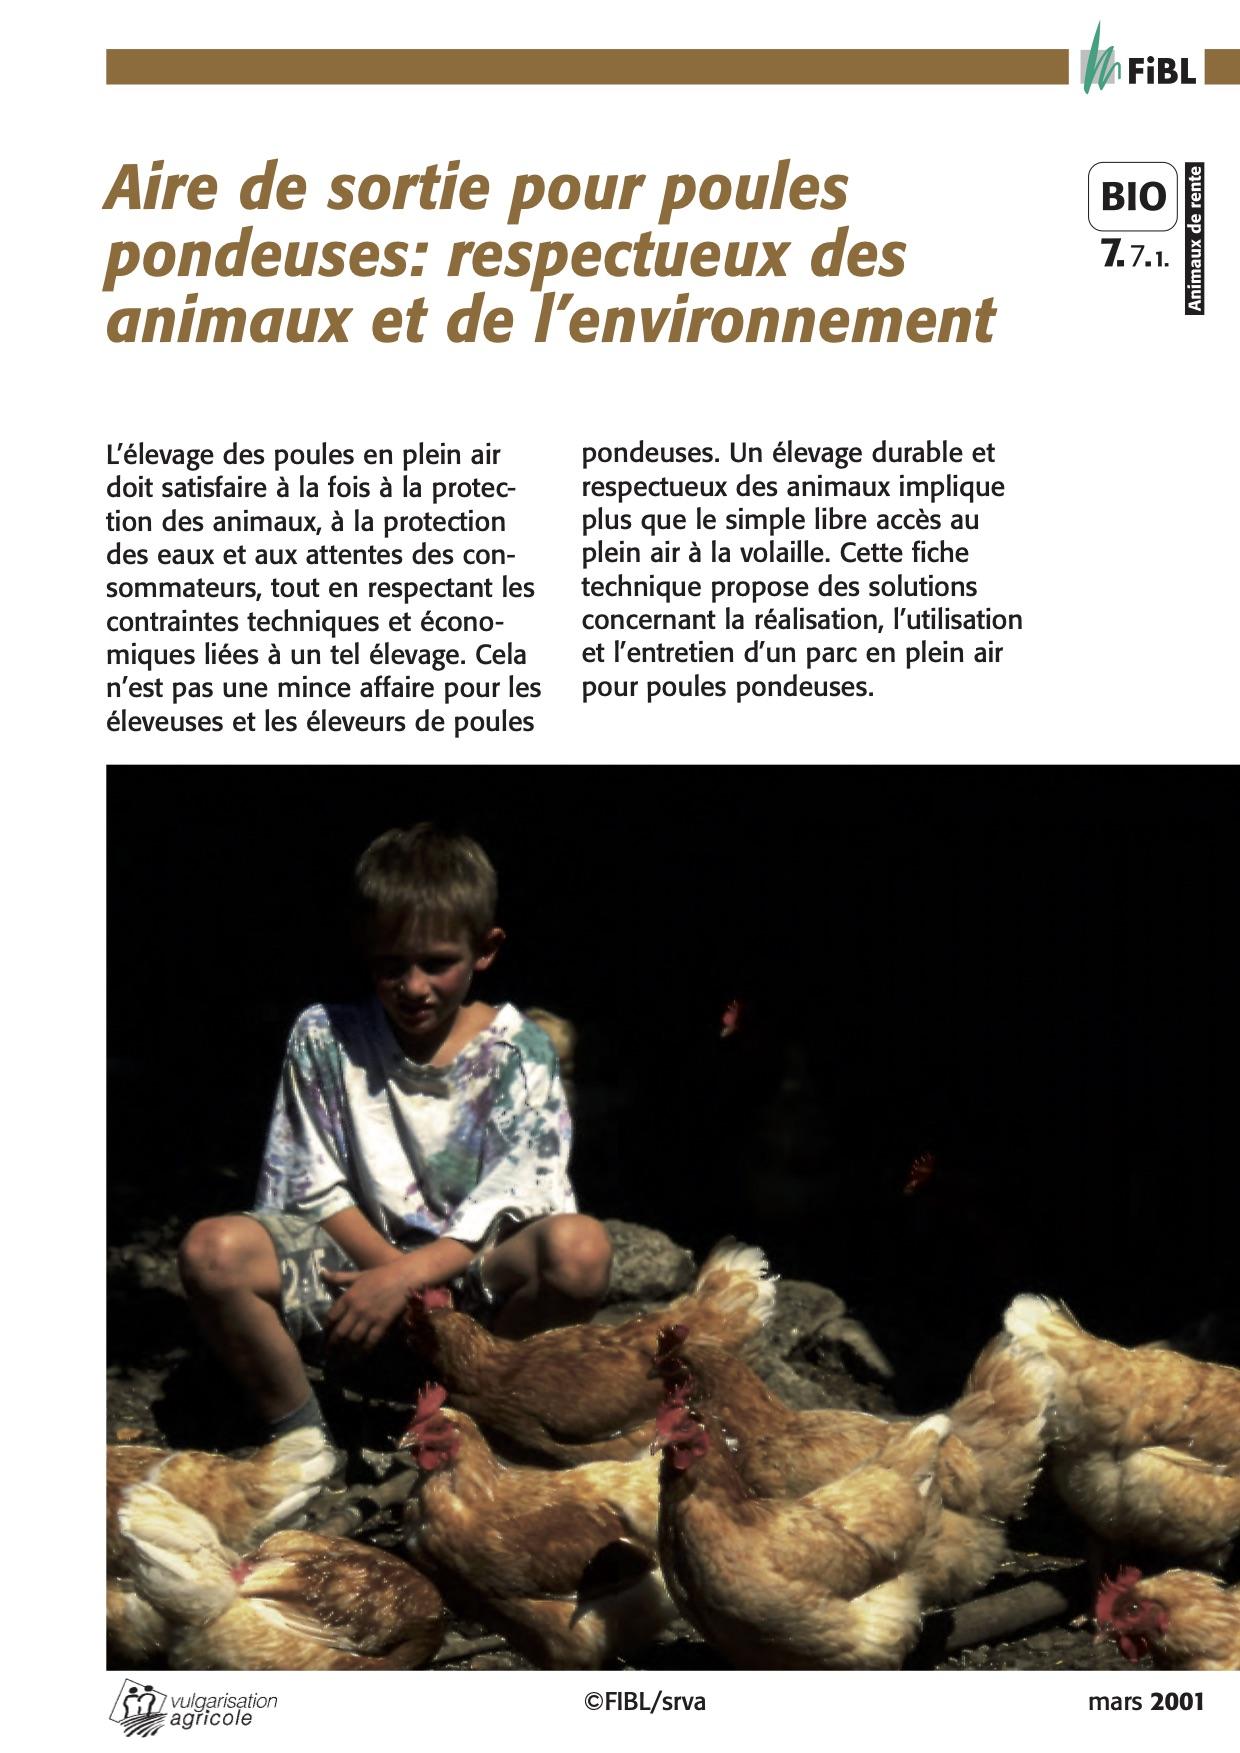 Free-range laying hens: animal and environment friendly